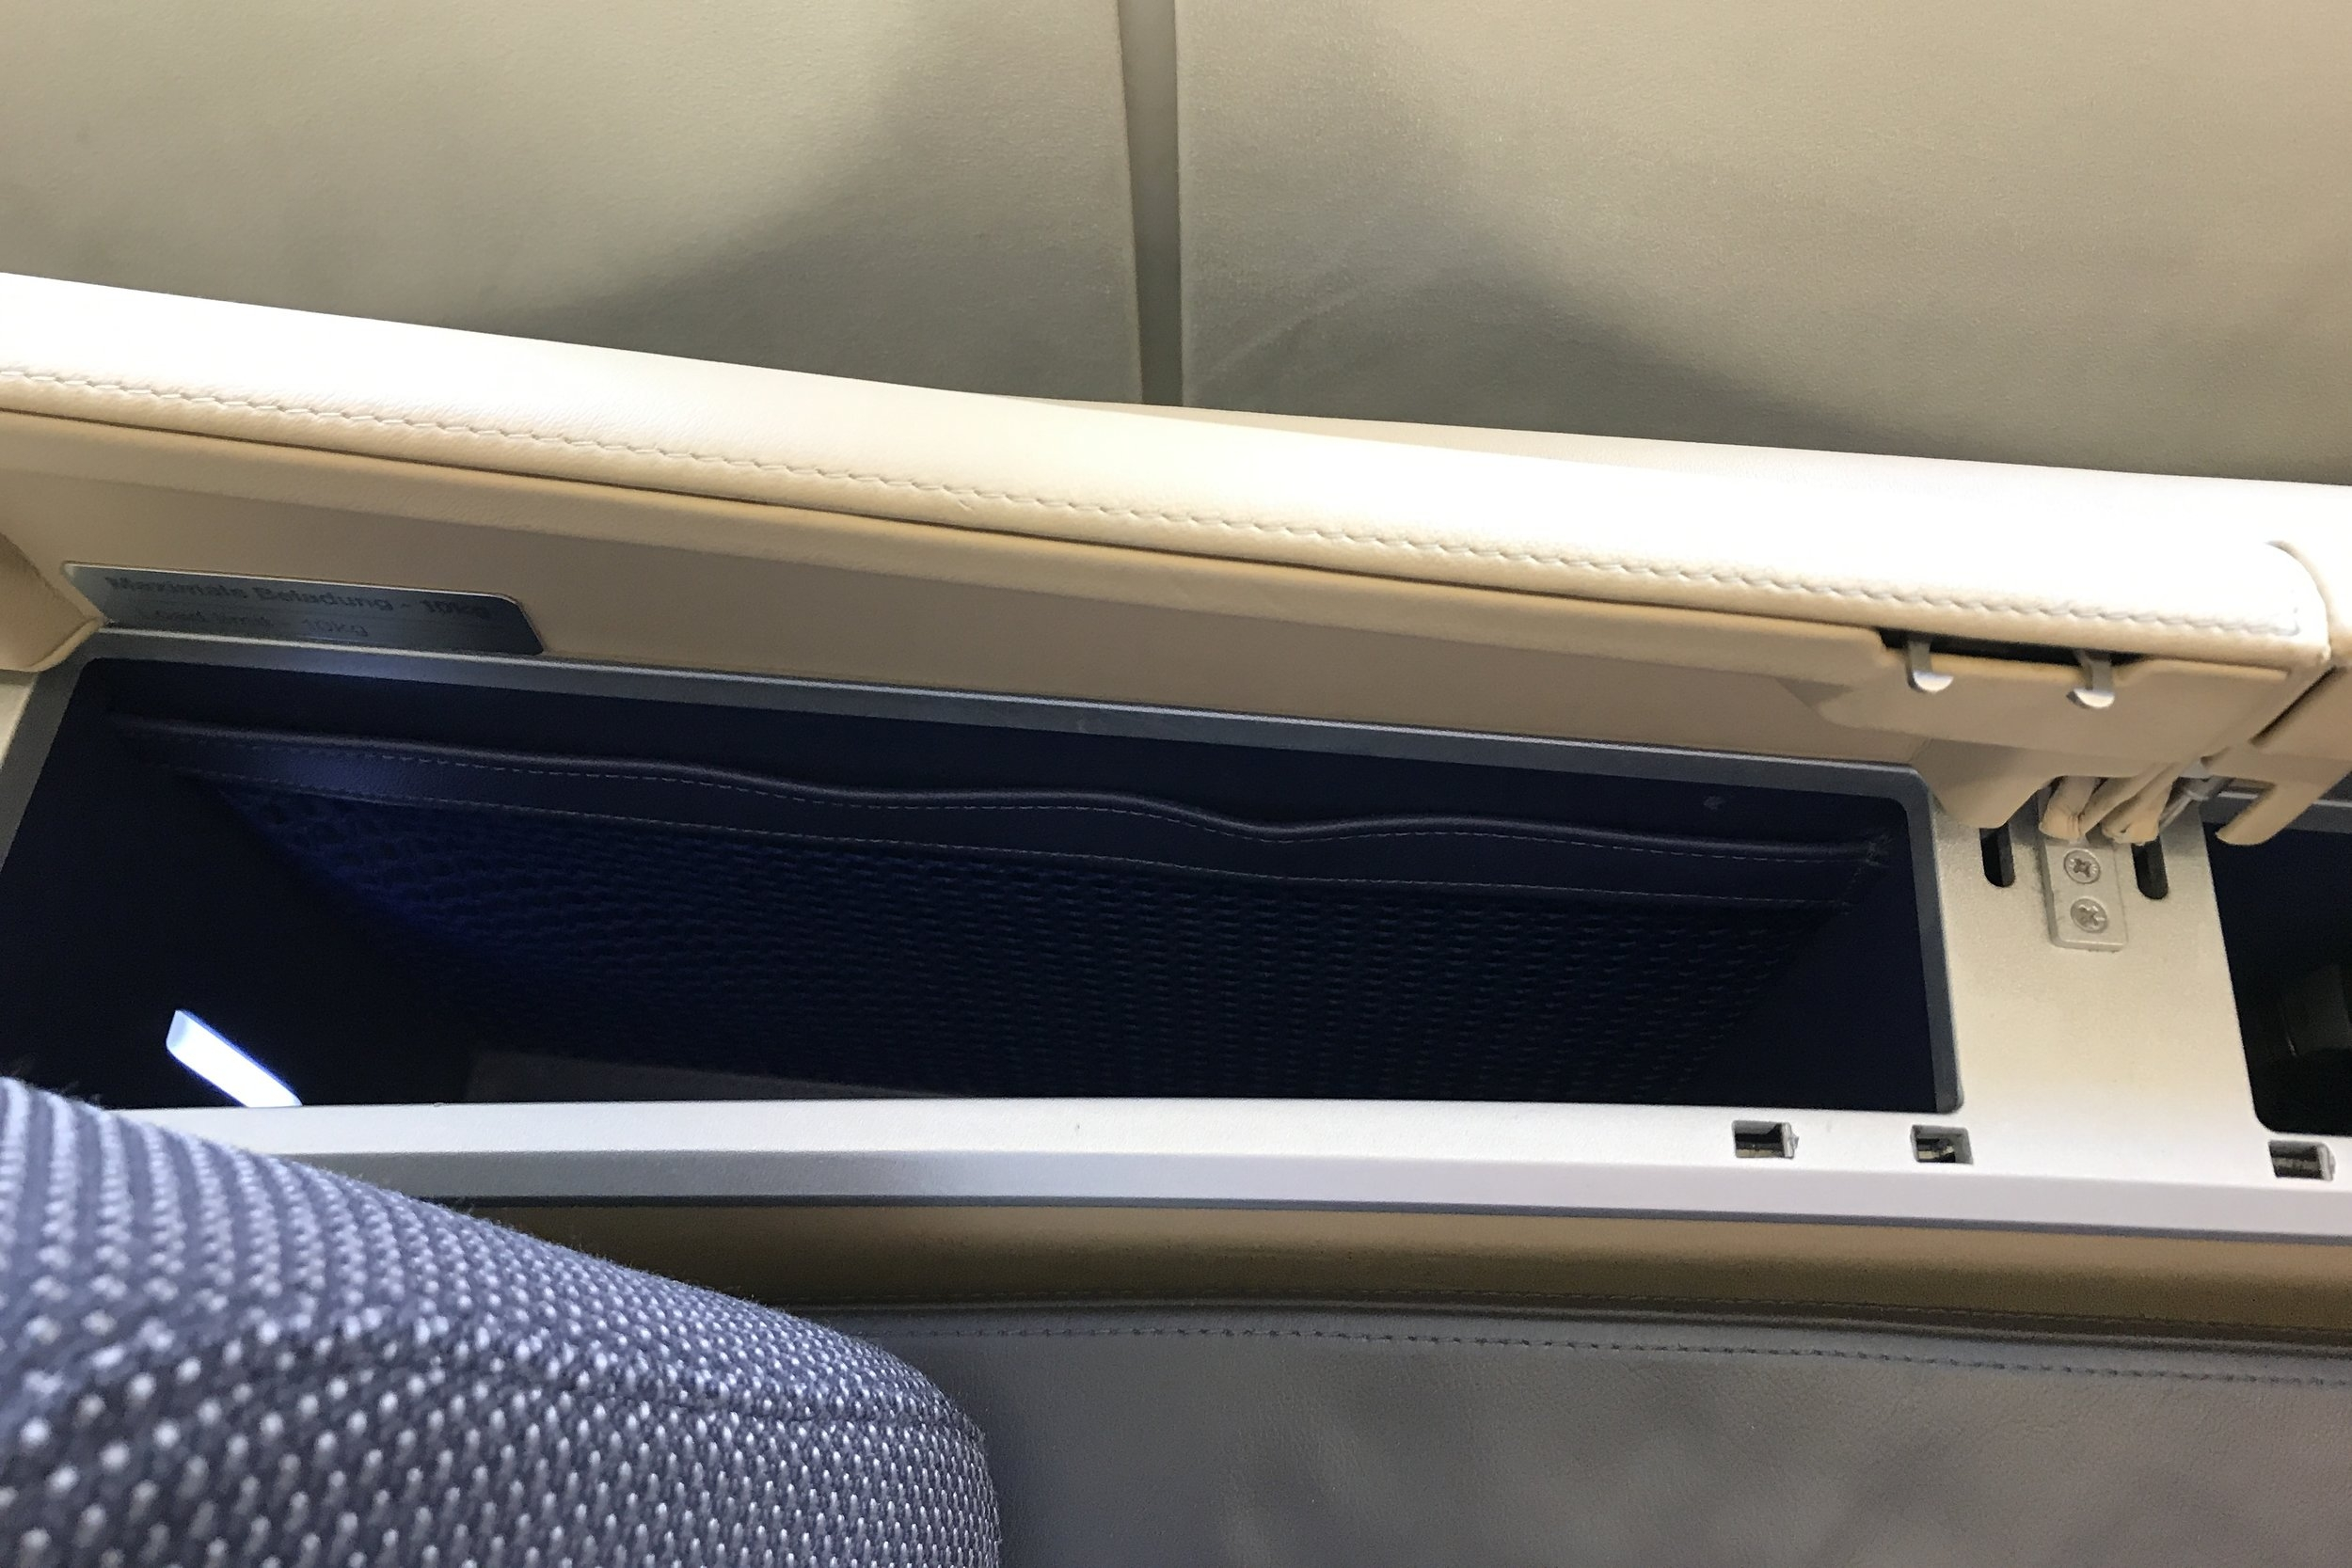 Lufthansa First Class – Storage compartment